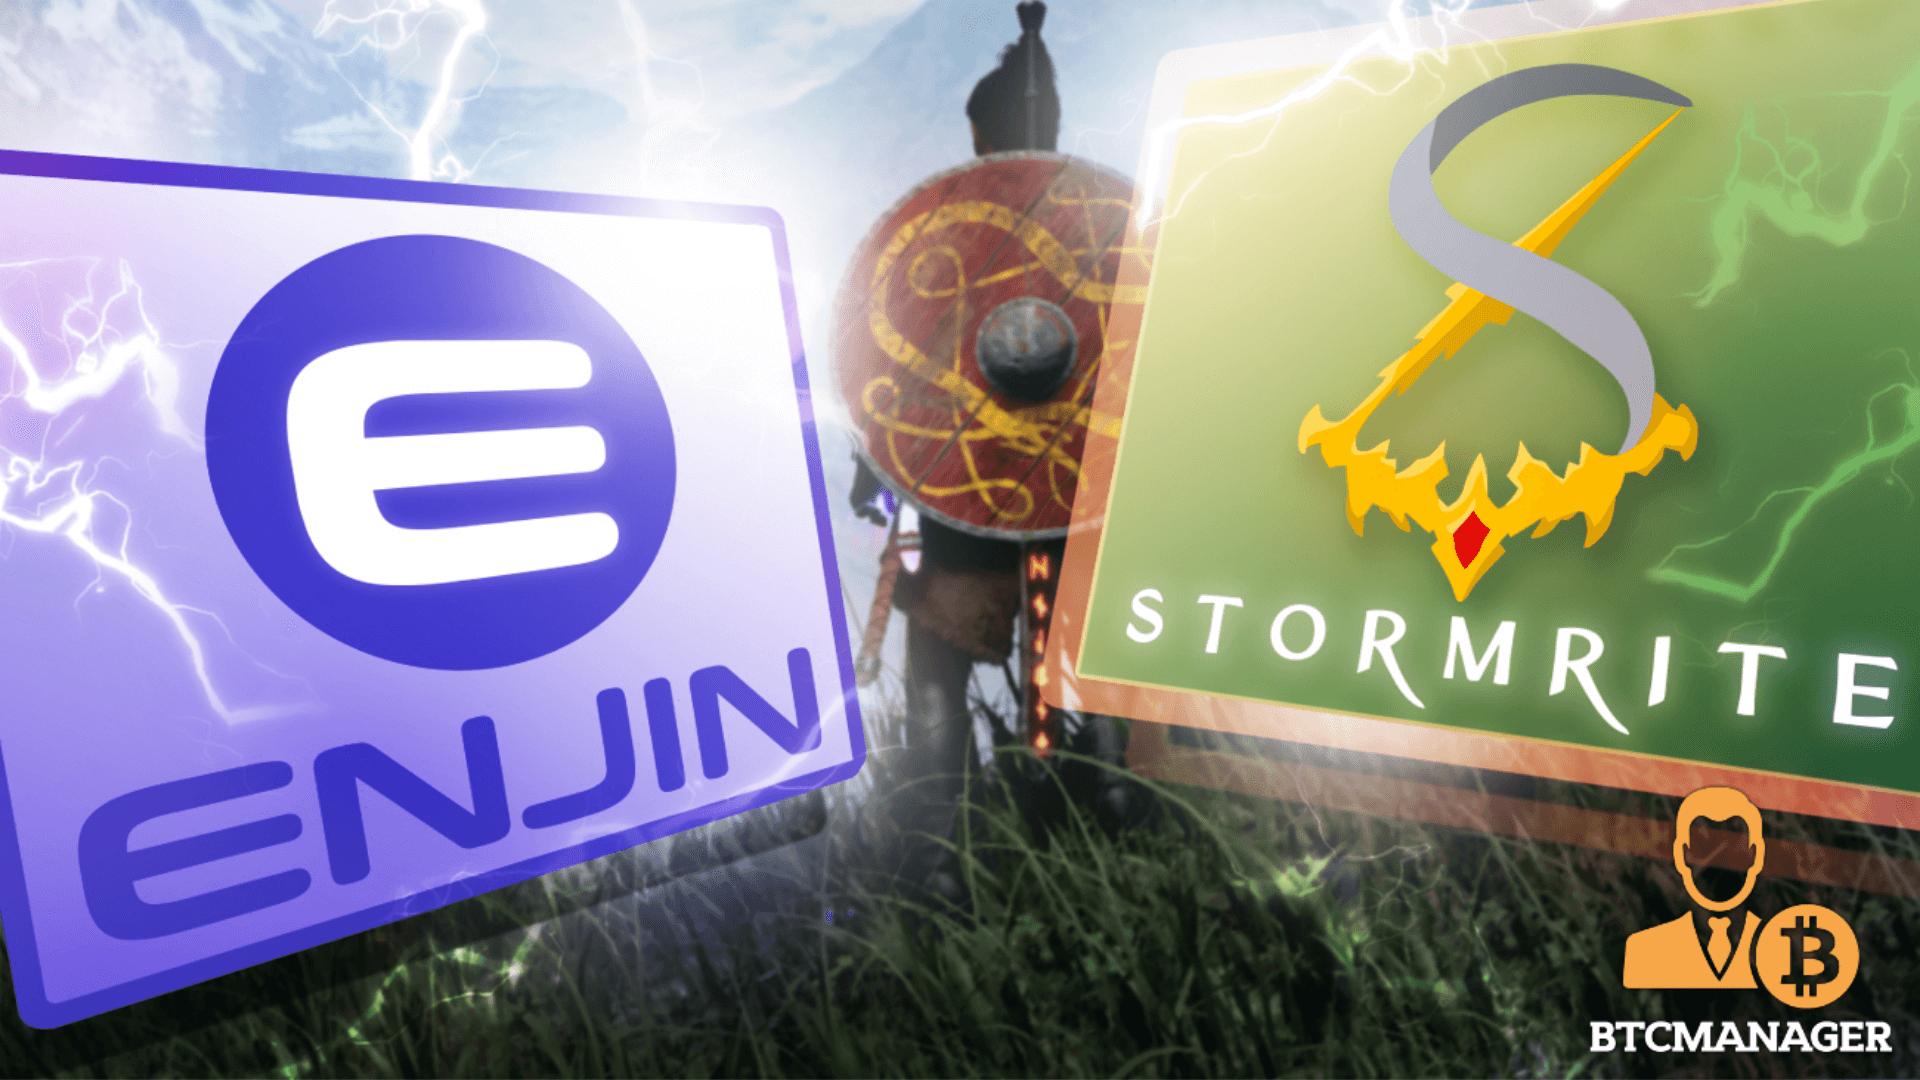 Enjin Welcomes Stormrite Following Its Successful Kickstarter Campaign